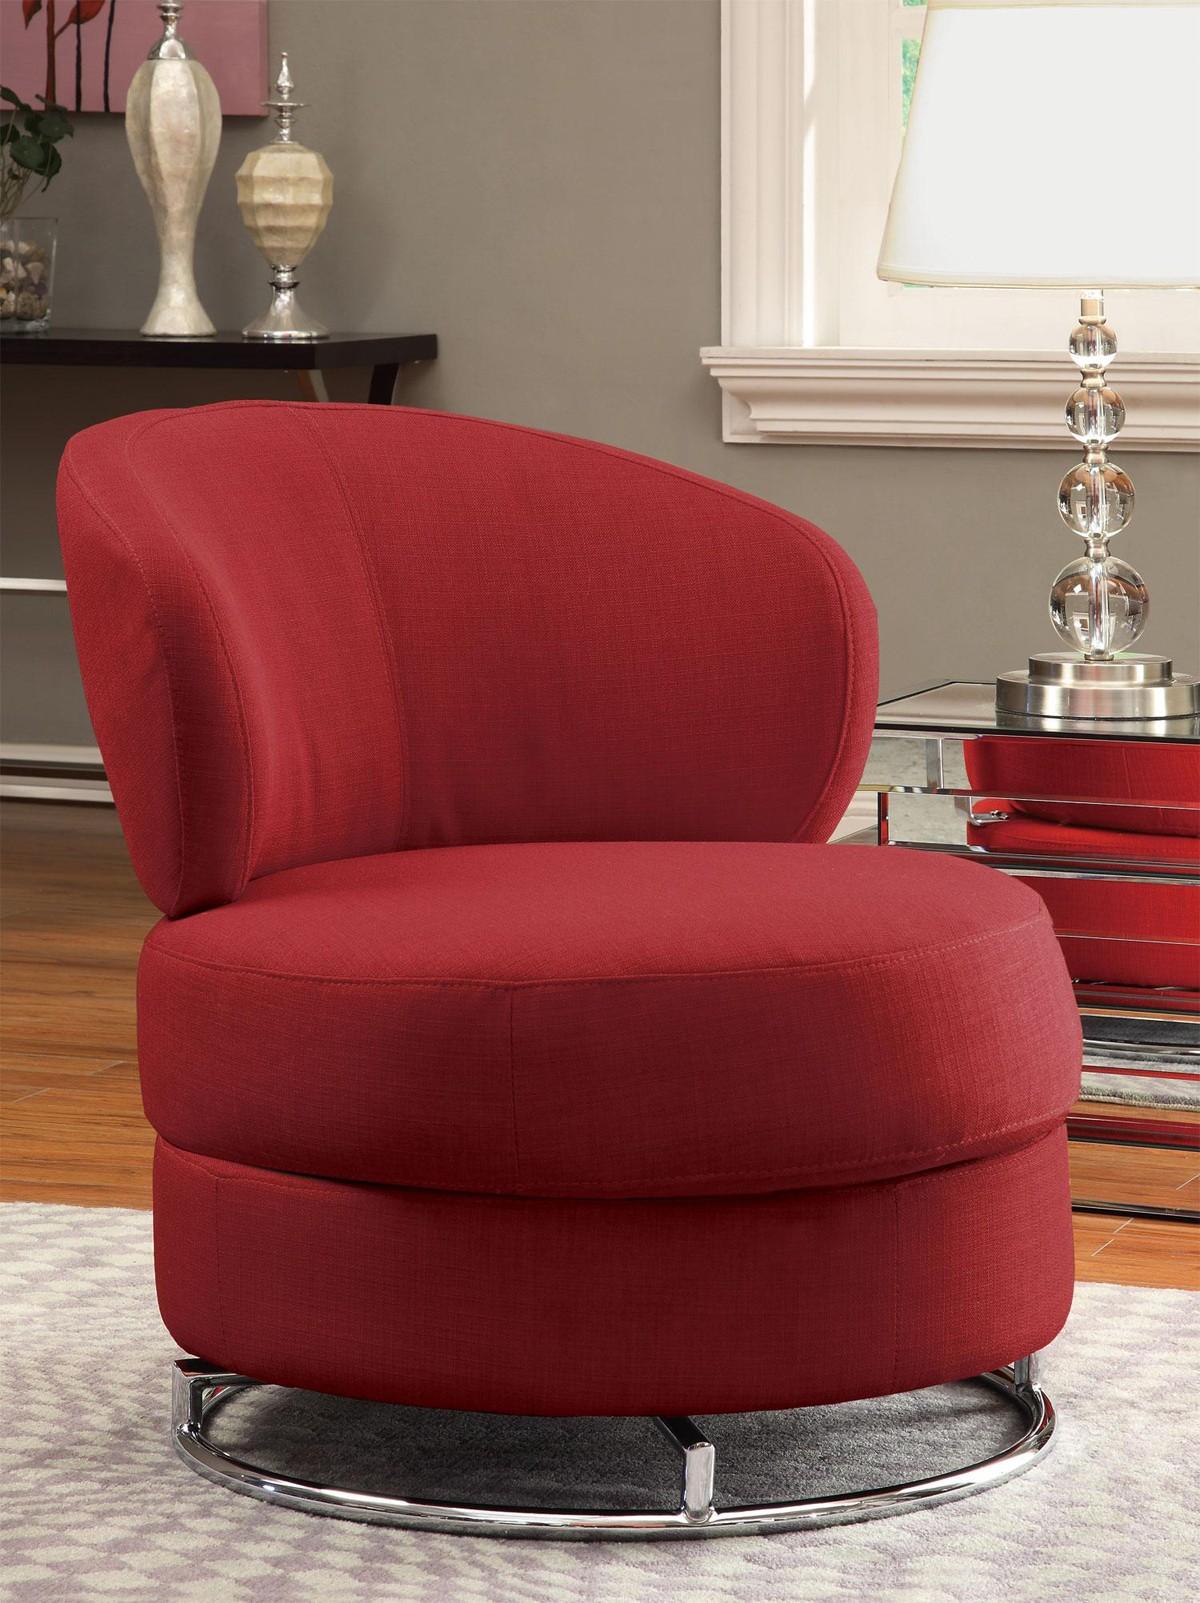 Swivel Chairs  Elegant Swivel Chairs For Living Room In Home   free swivel chairs with swivel chairs . Large Swivel Chairs Living Room. Home Design Ideas